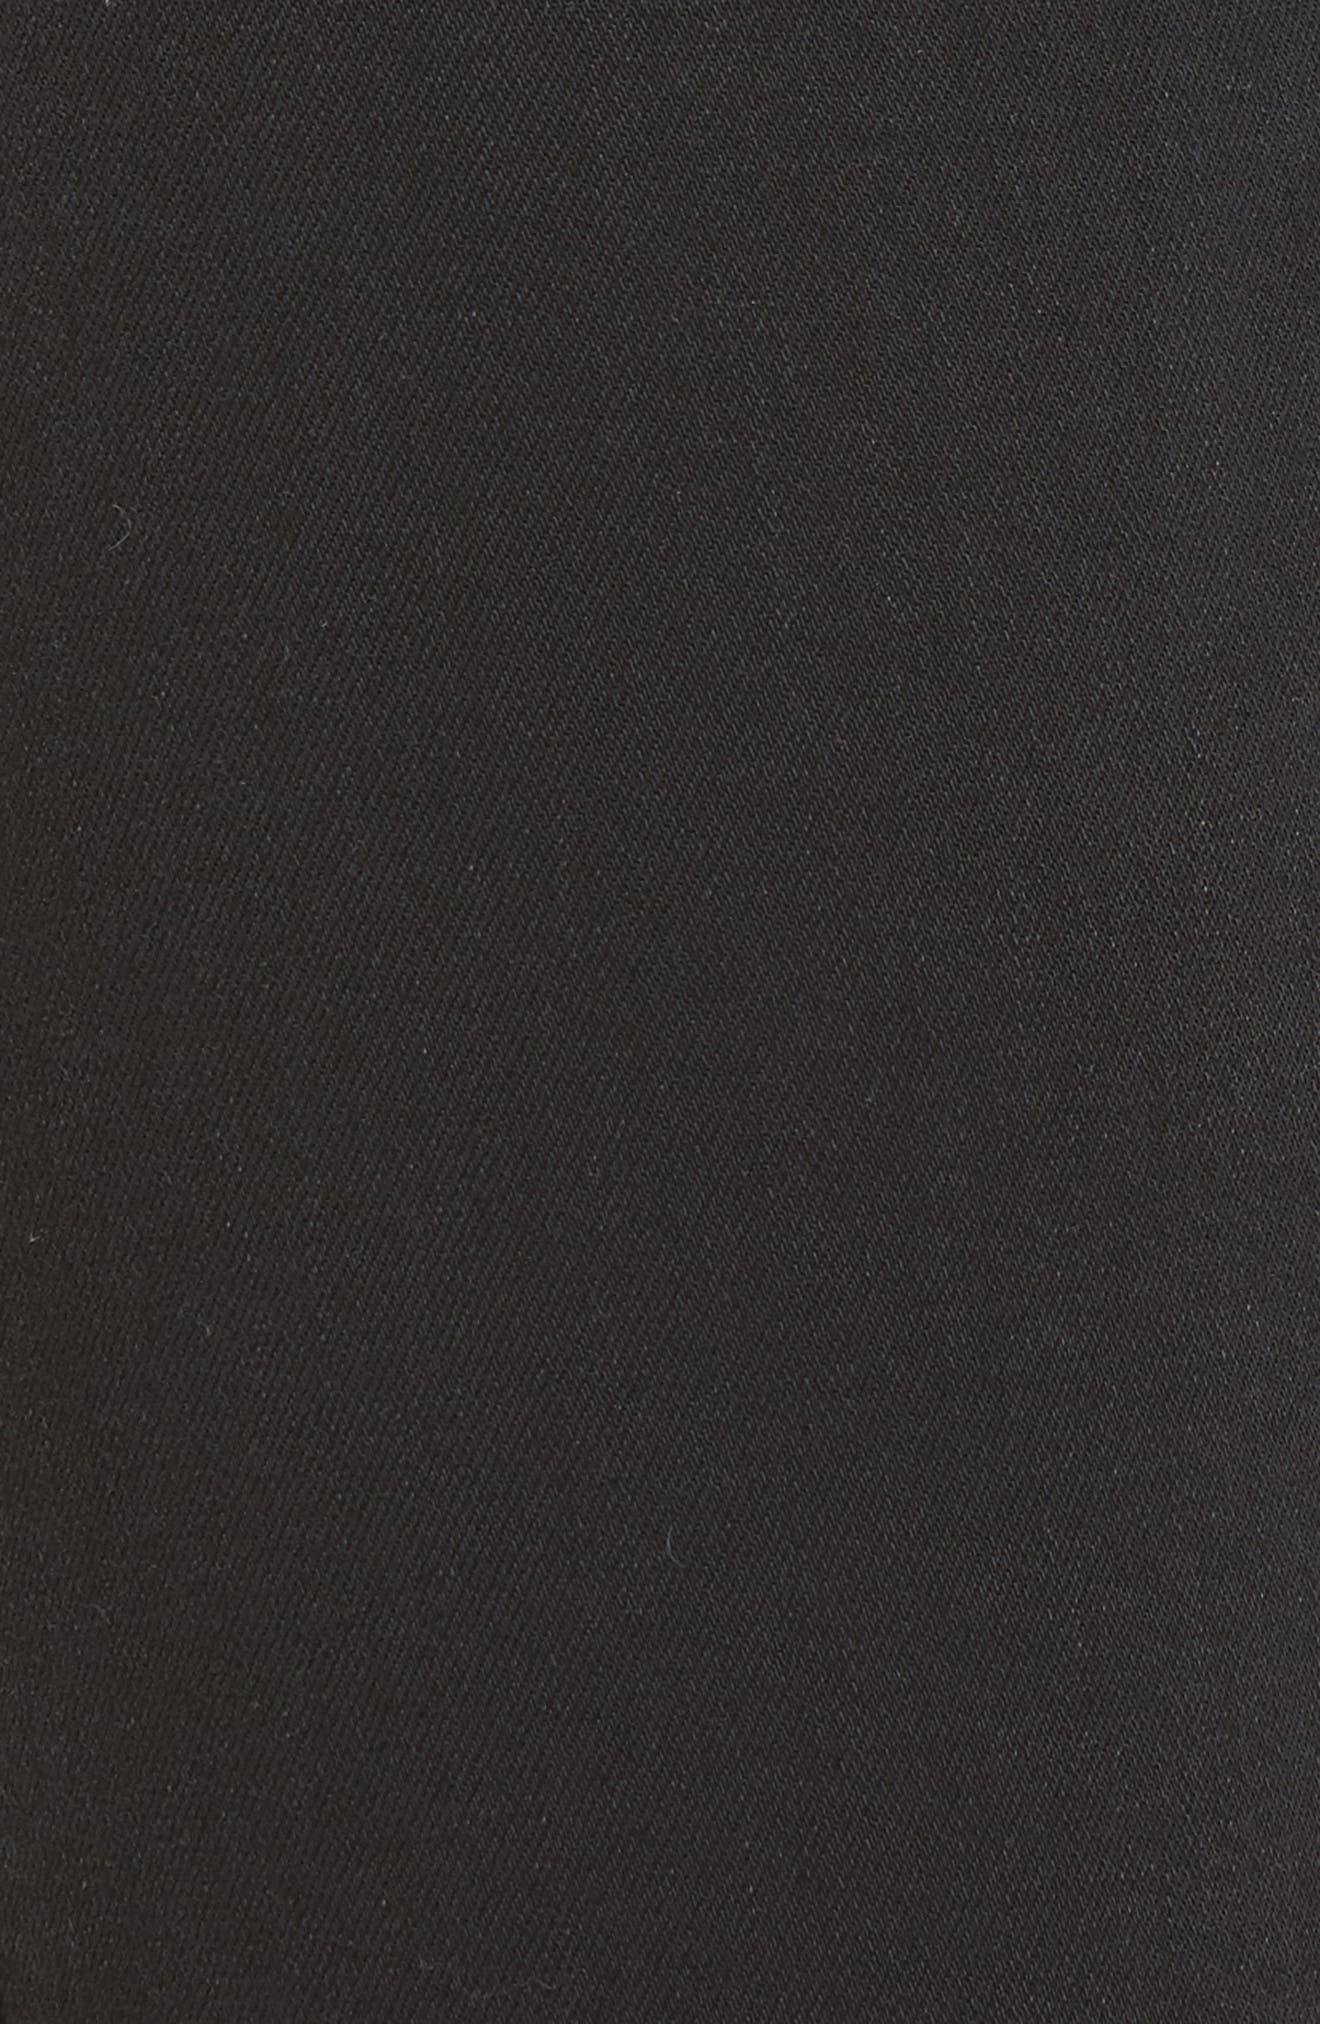 Transcend - Colette High Waist Crop Flare Jeans,                             Alternate thumbnail 6, color,                             001